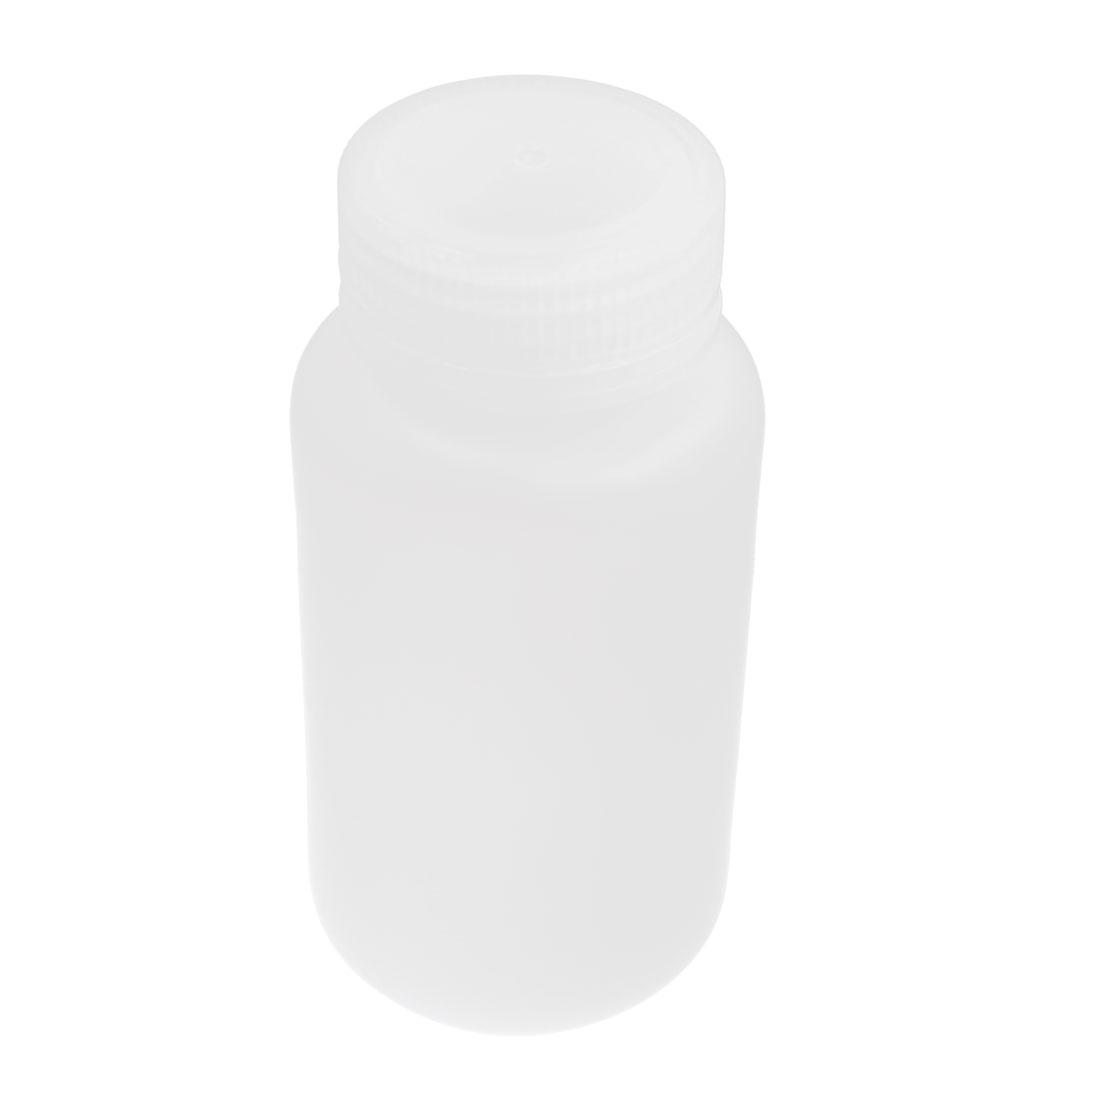 Plastic Screw Lid 250mL 8 oz Chemicals Storage Container White Plastic Reagent Bottle